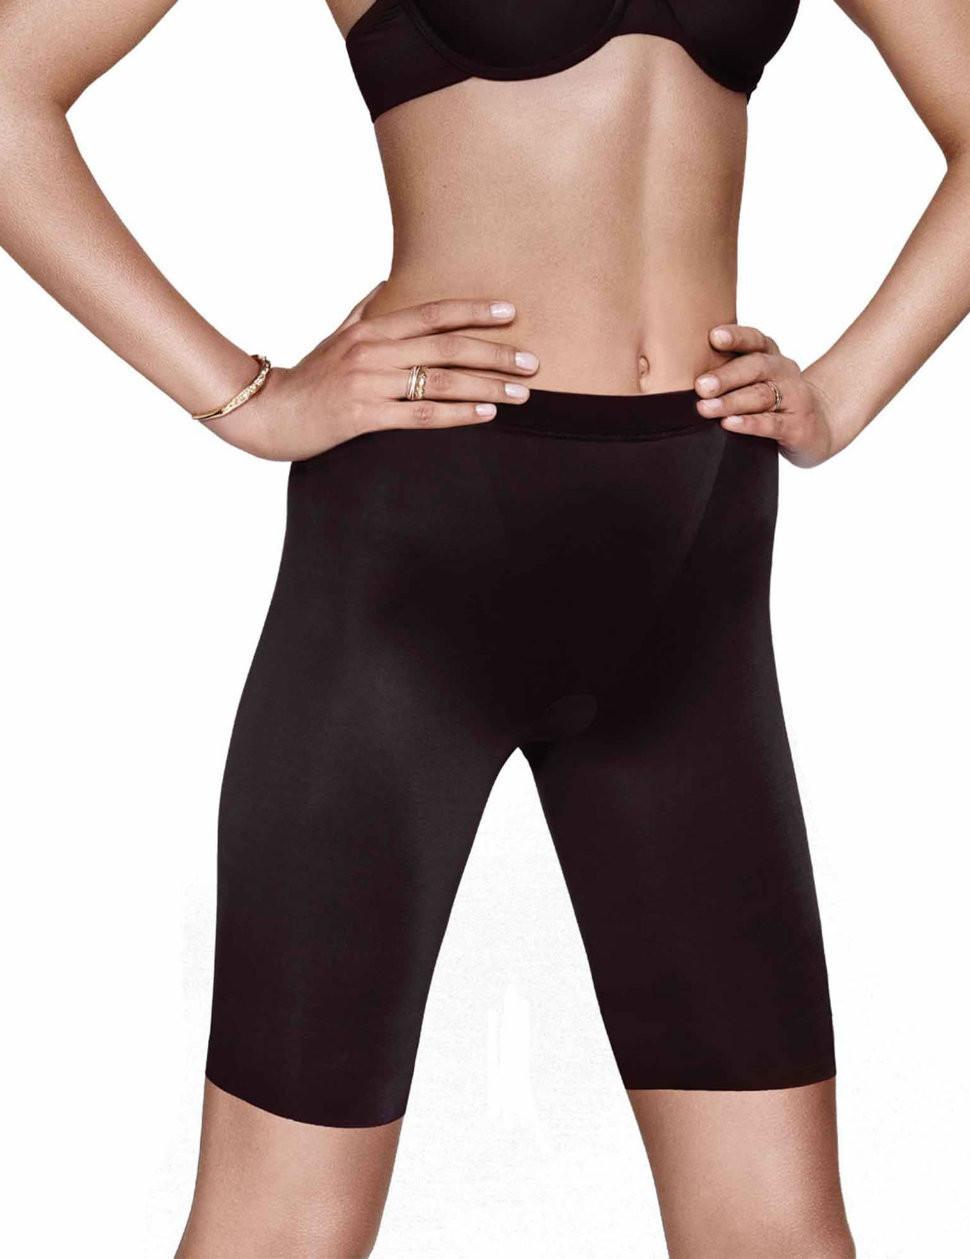 Корректирующие панталоны Flexees® Instant Slimmer®